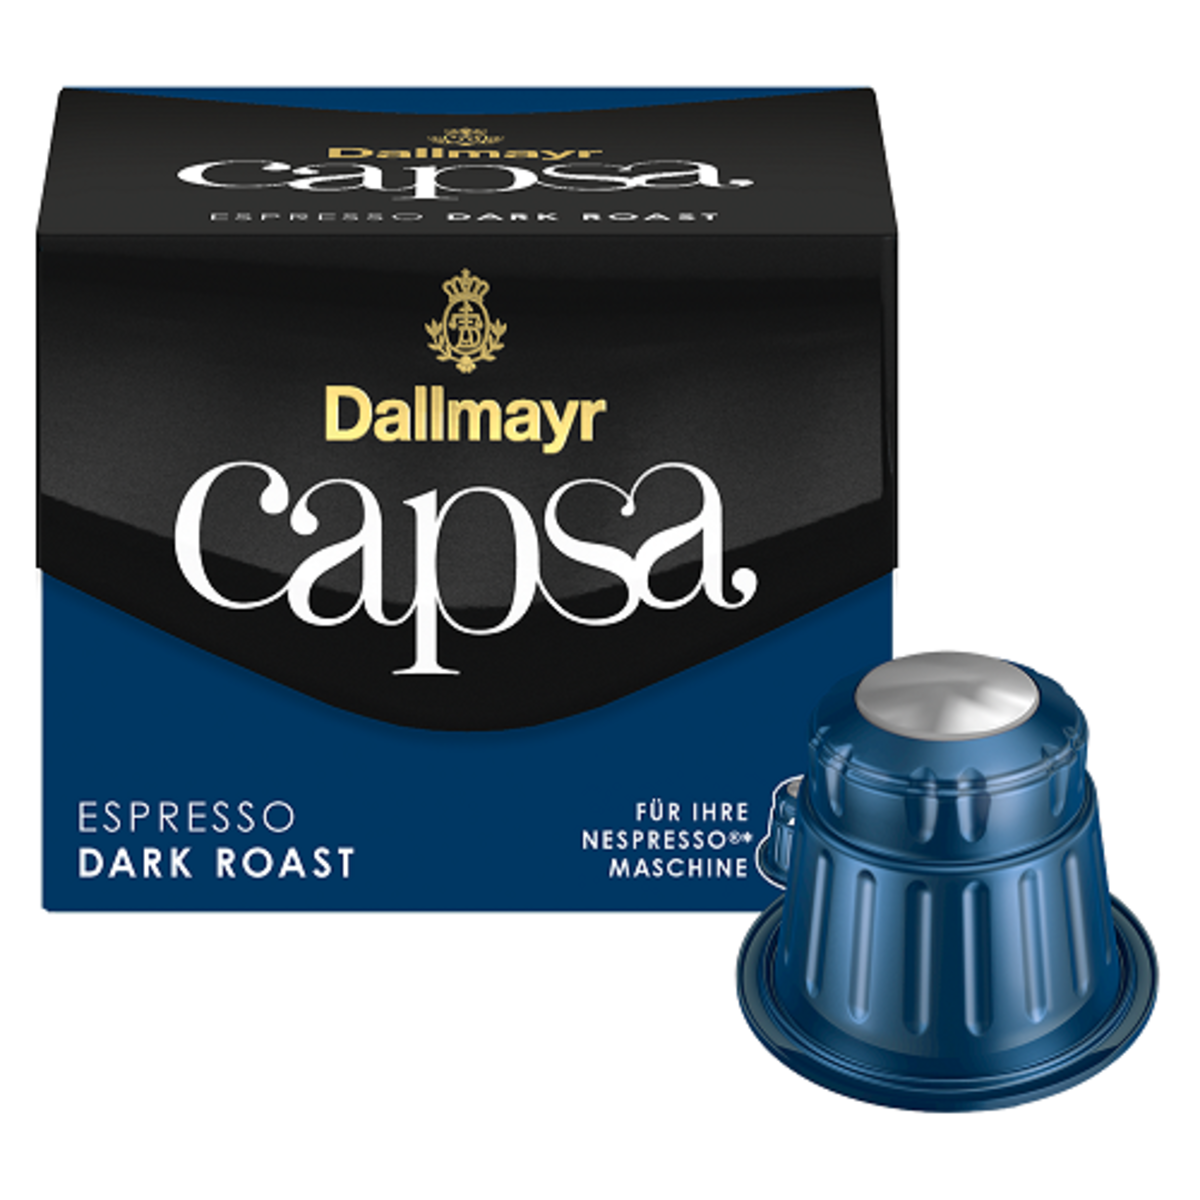 Dallmayr Espresso Dark Roast - Nespresso съвместими капсули